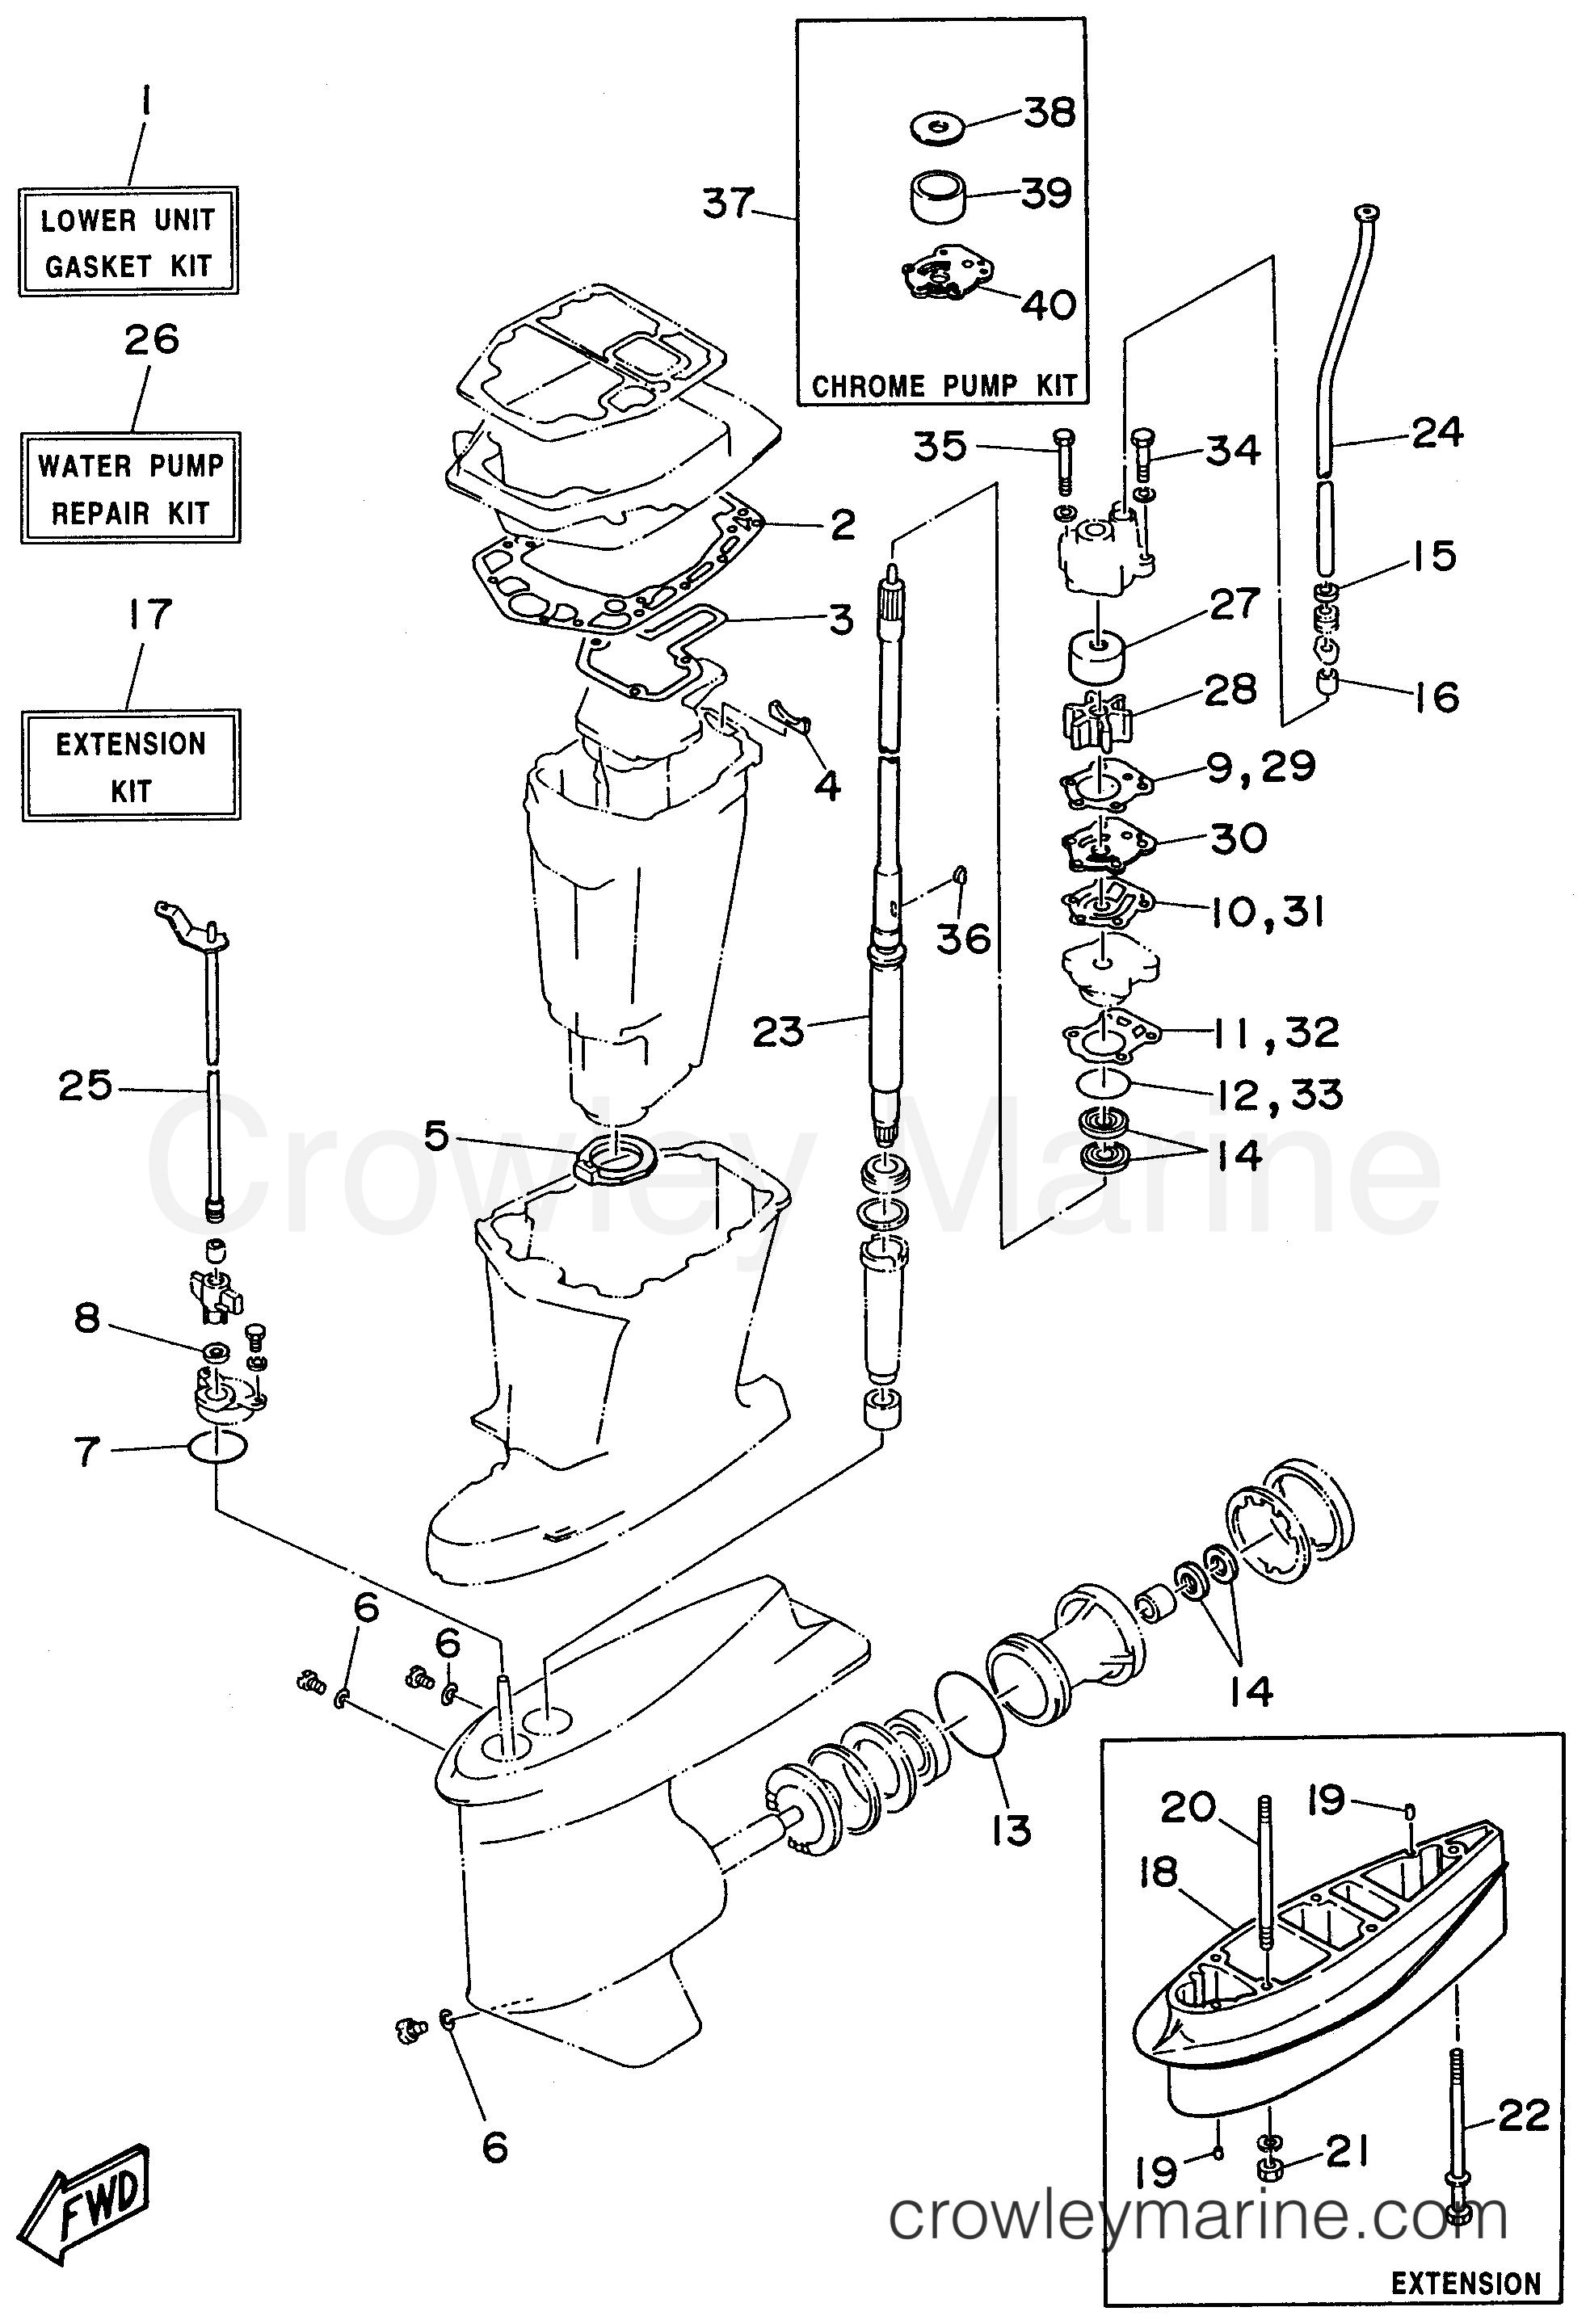 repair kit 2 1996 yamaha outboard 75hp c75tlru crowley marine. Black Bedroom Furniture Sets. Home Design Ideas